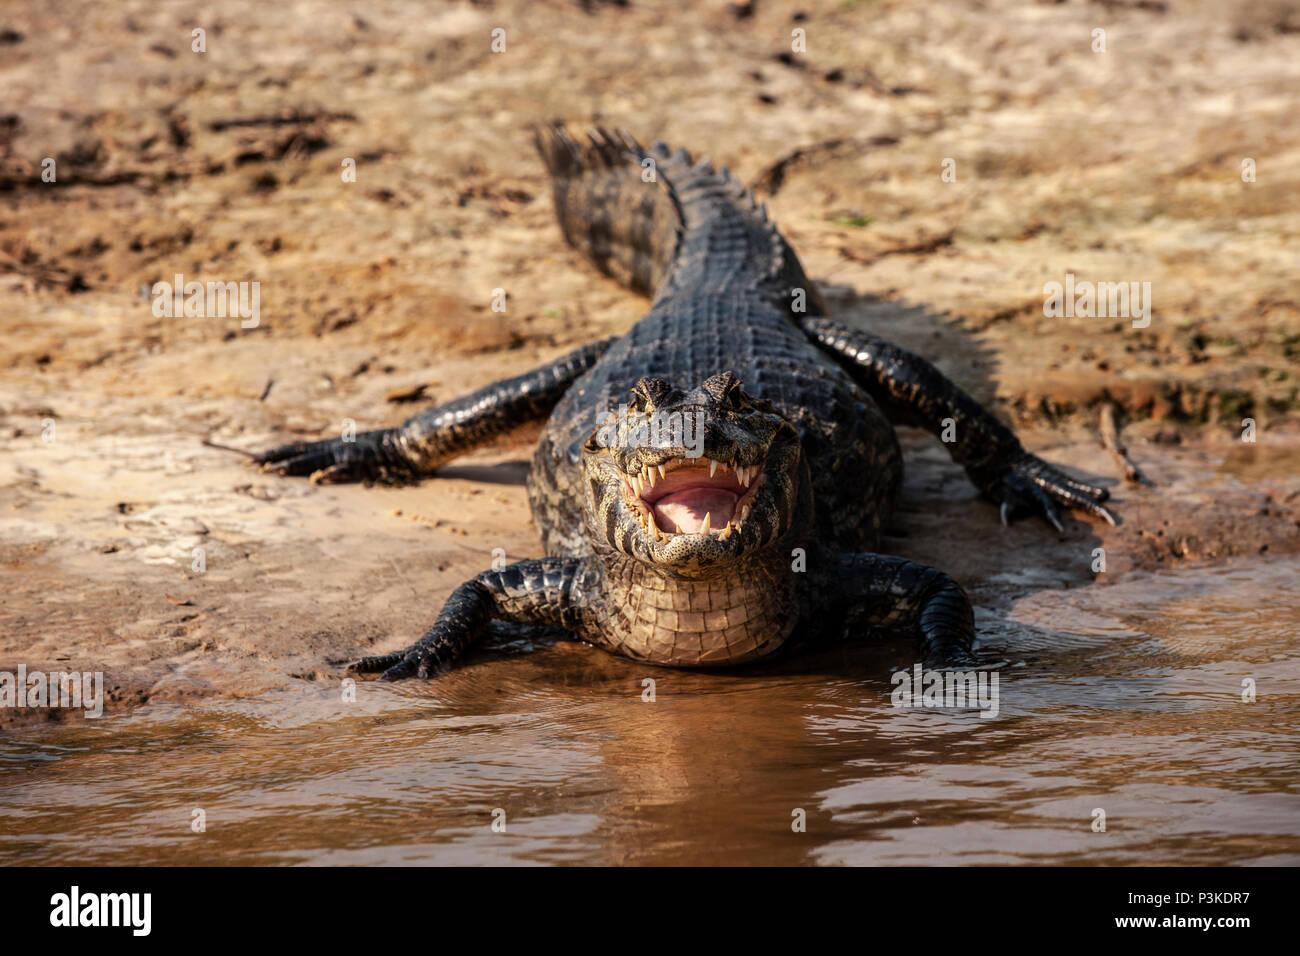 caiman at the water's edge, River Sao Lourenco, Pantanal, Brazil - Stock Image